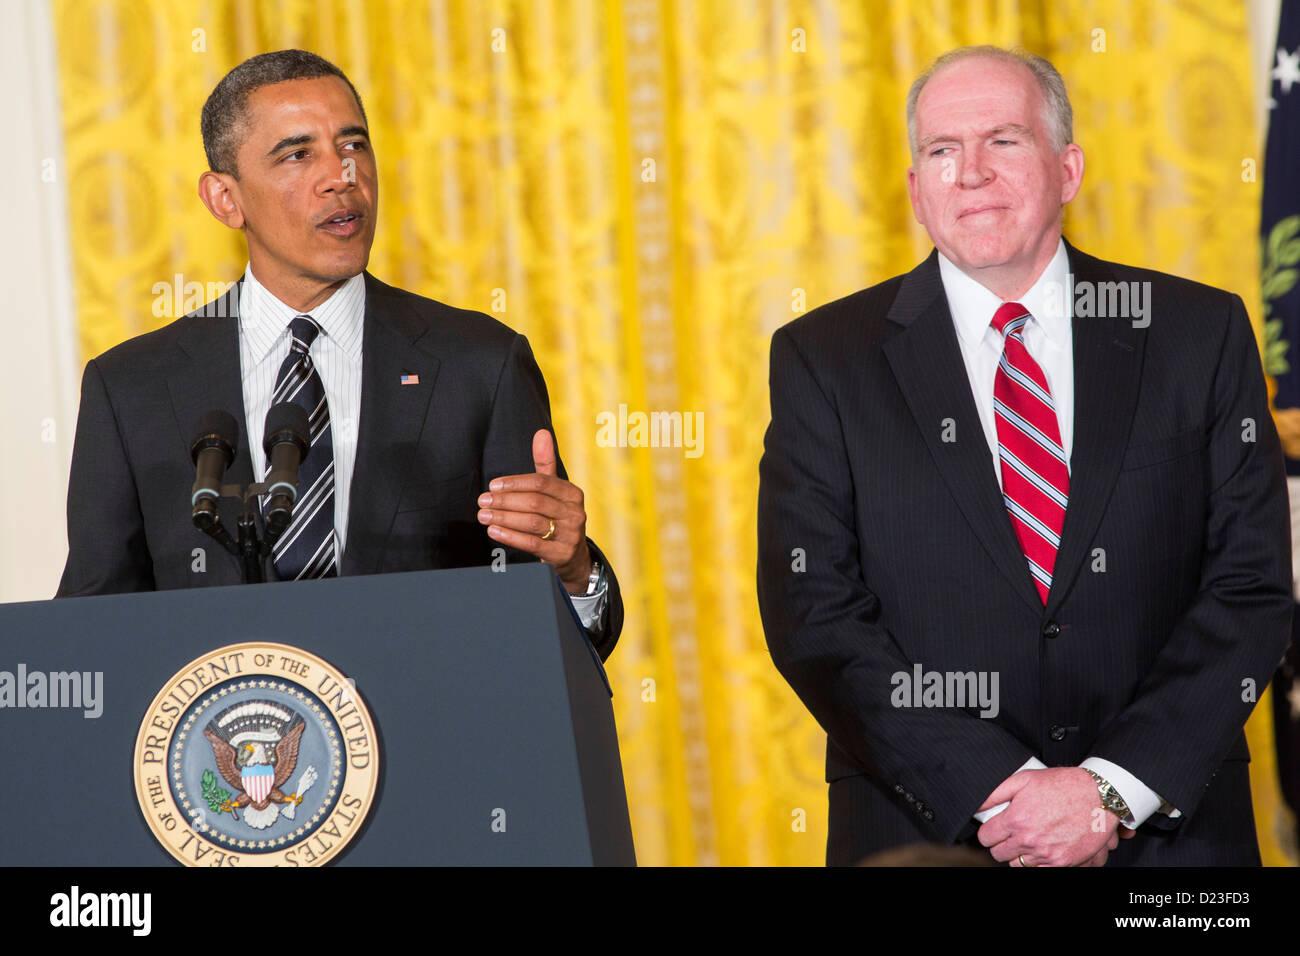 President Barack Obama nominates John Brennan as the new Director of the CIA.  - Stock Image